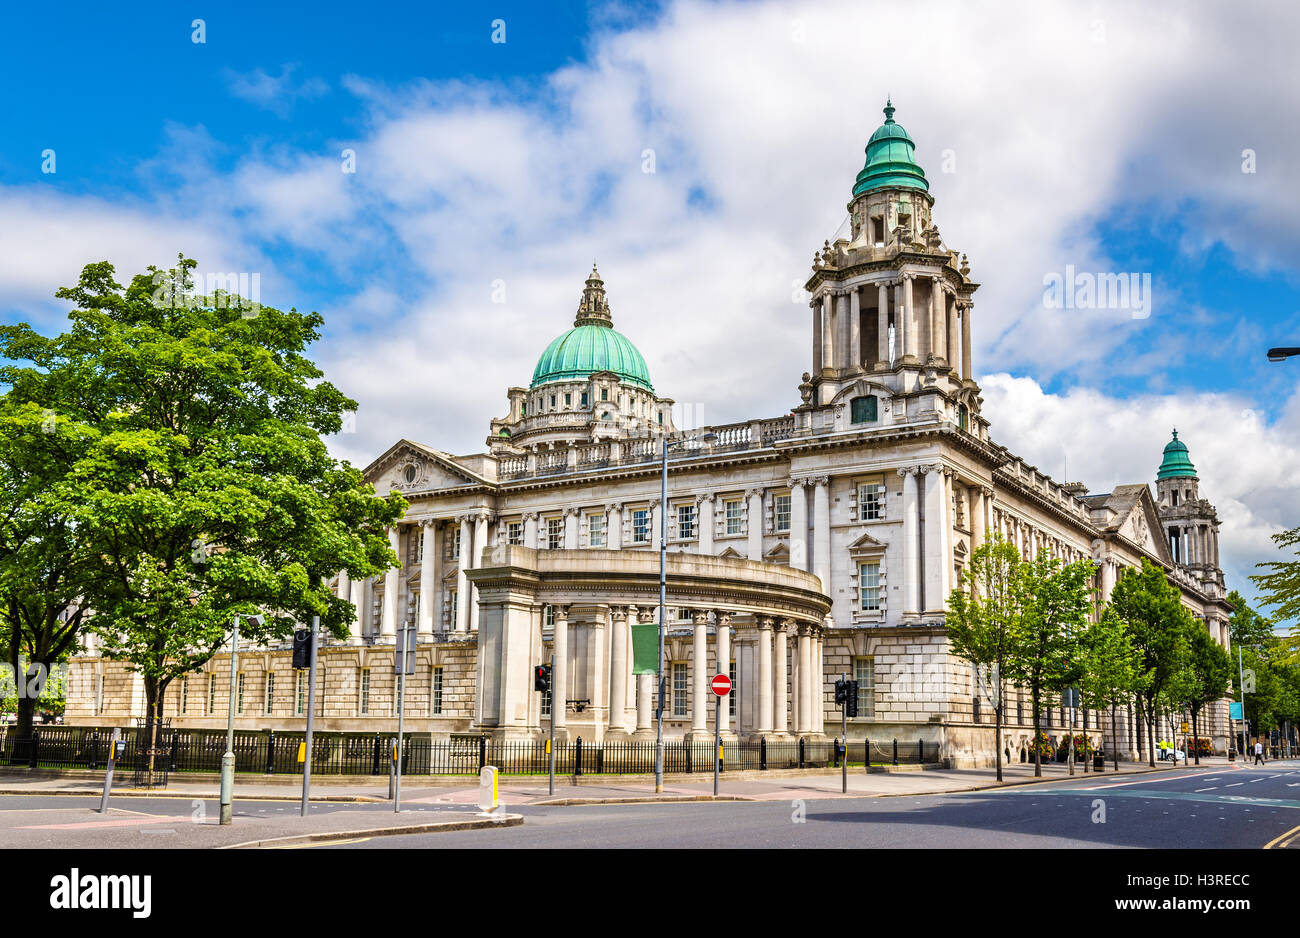 Belfast City Hall - Northern Ireland, United Kingdom - Stock Image